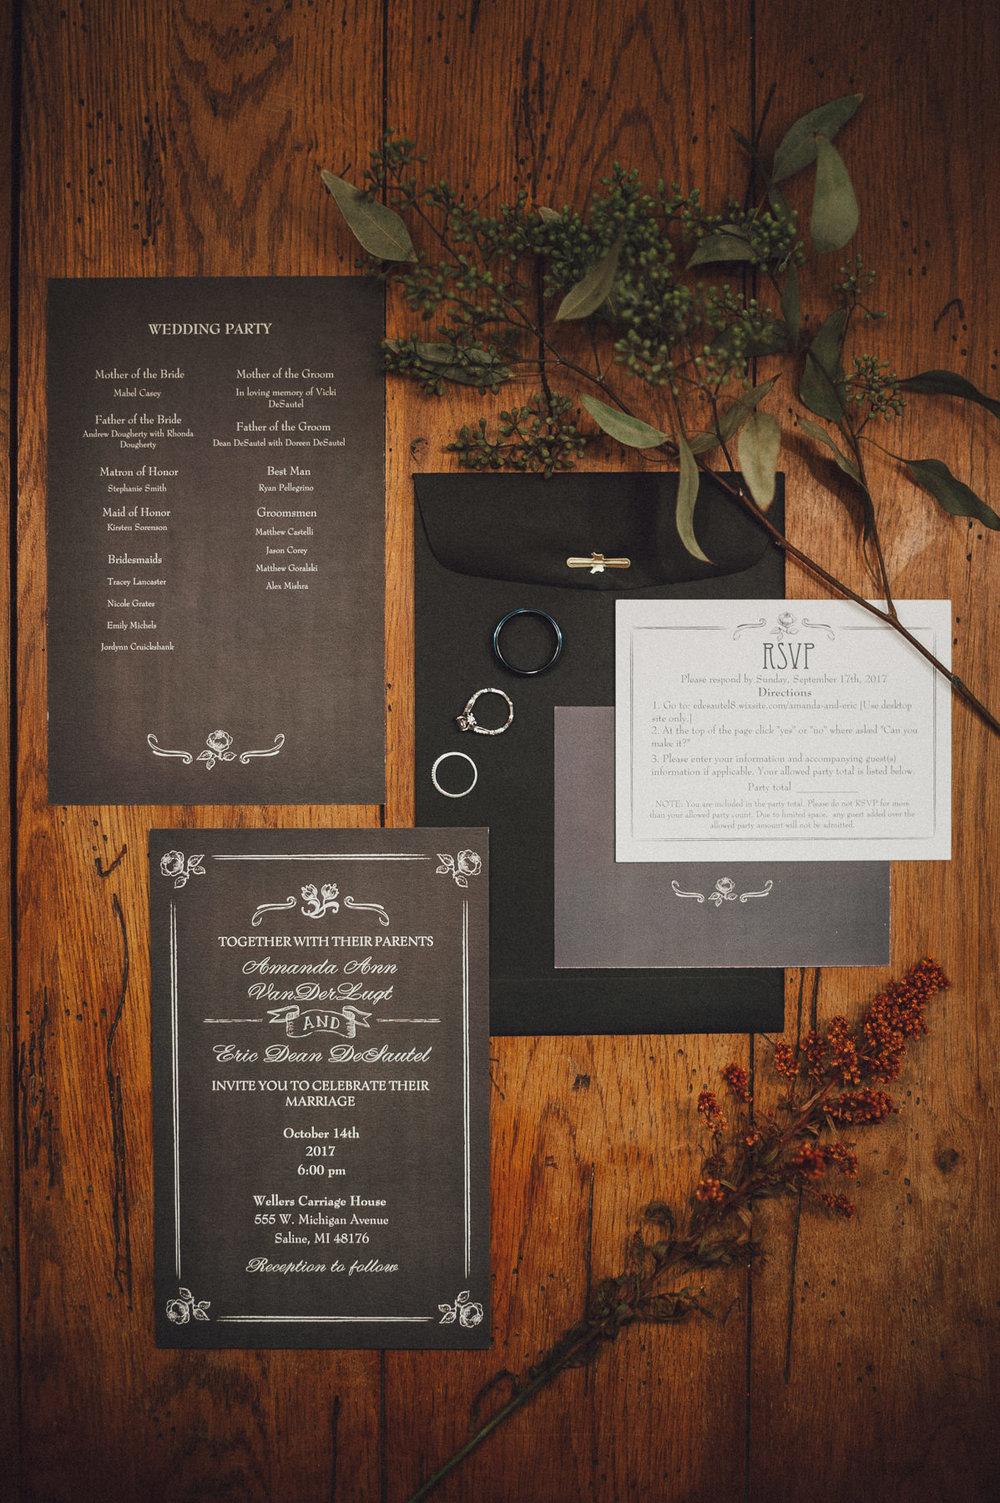 breighton-and-basette-photography-copyrighted-image-blog-amanda-and-eric-wedding-001.jpg